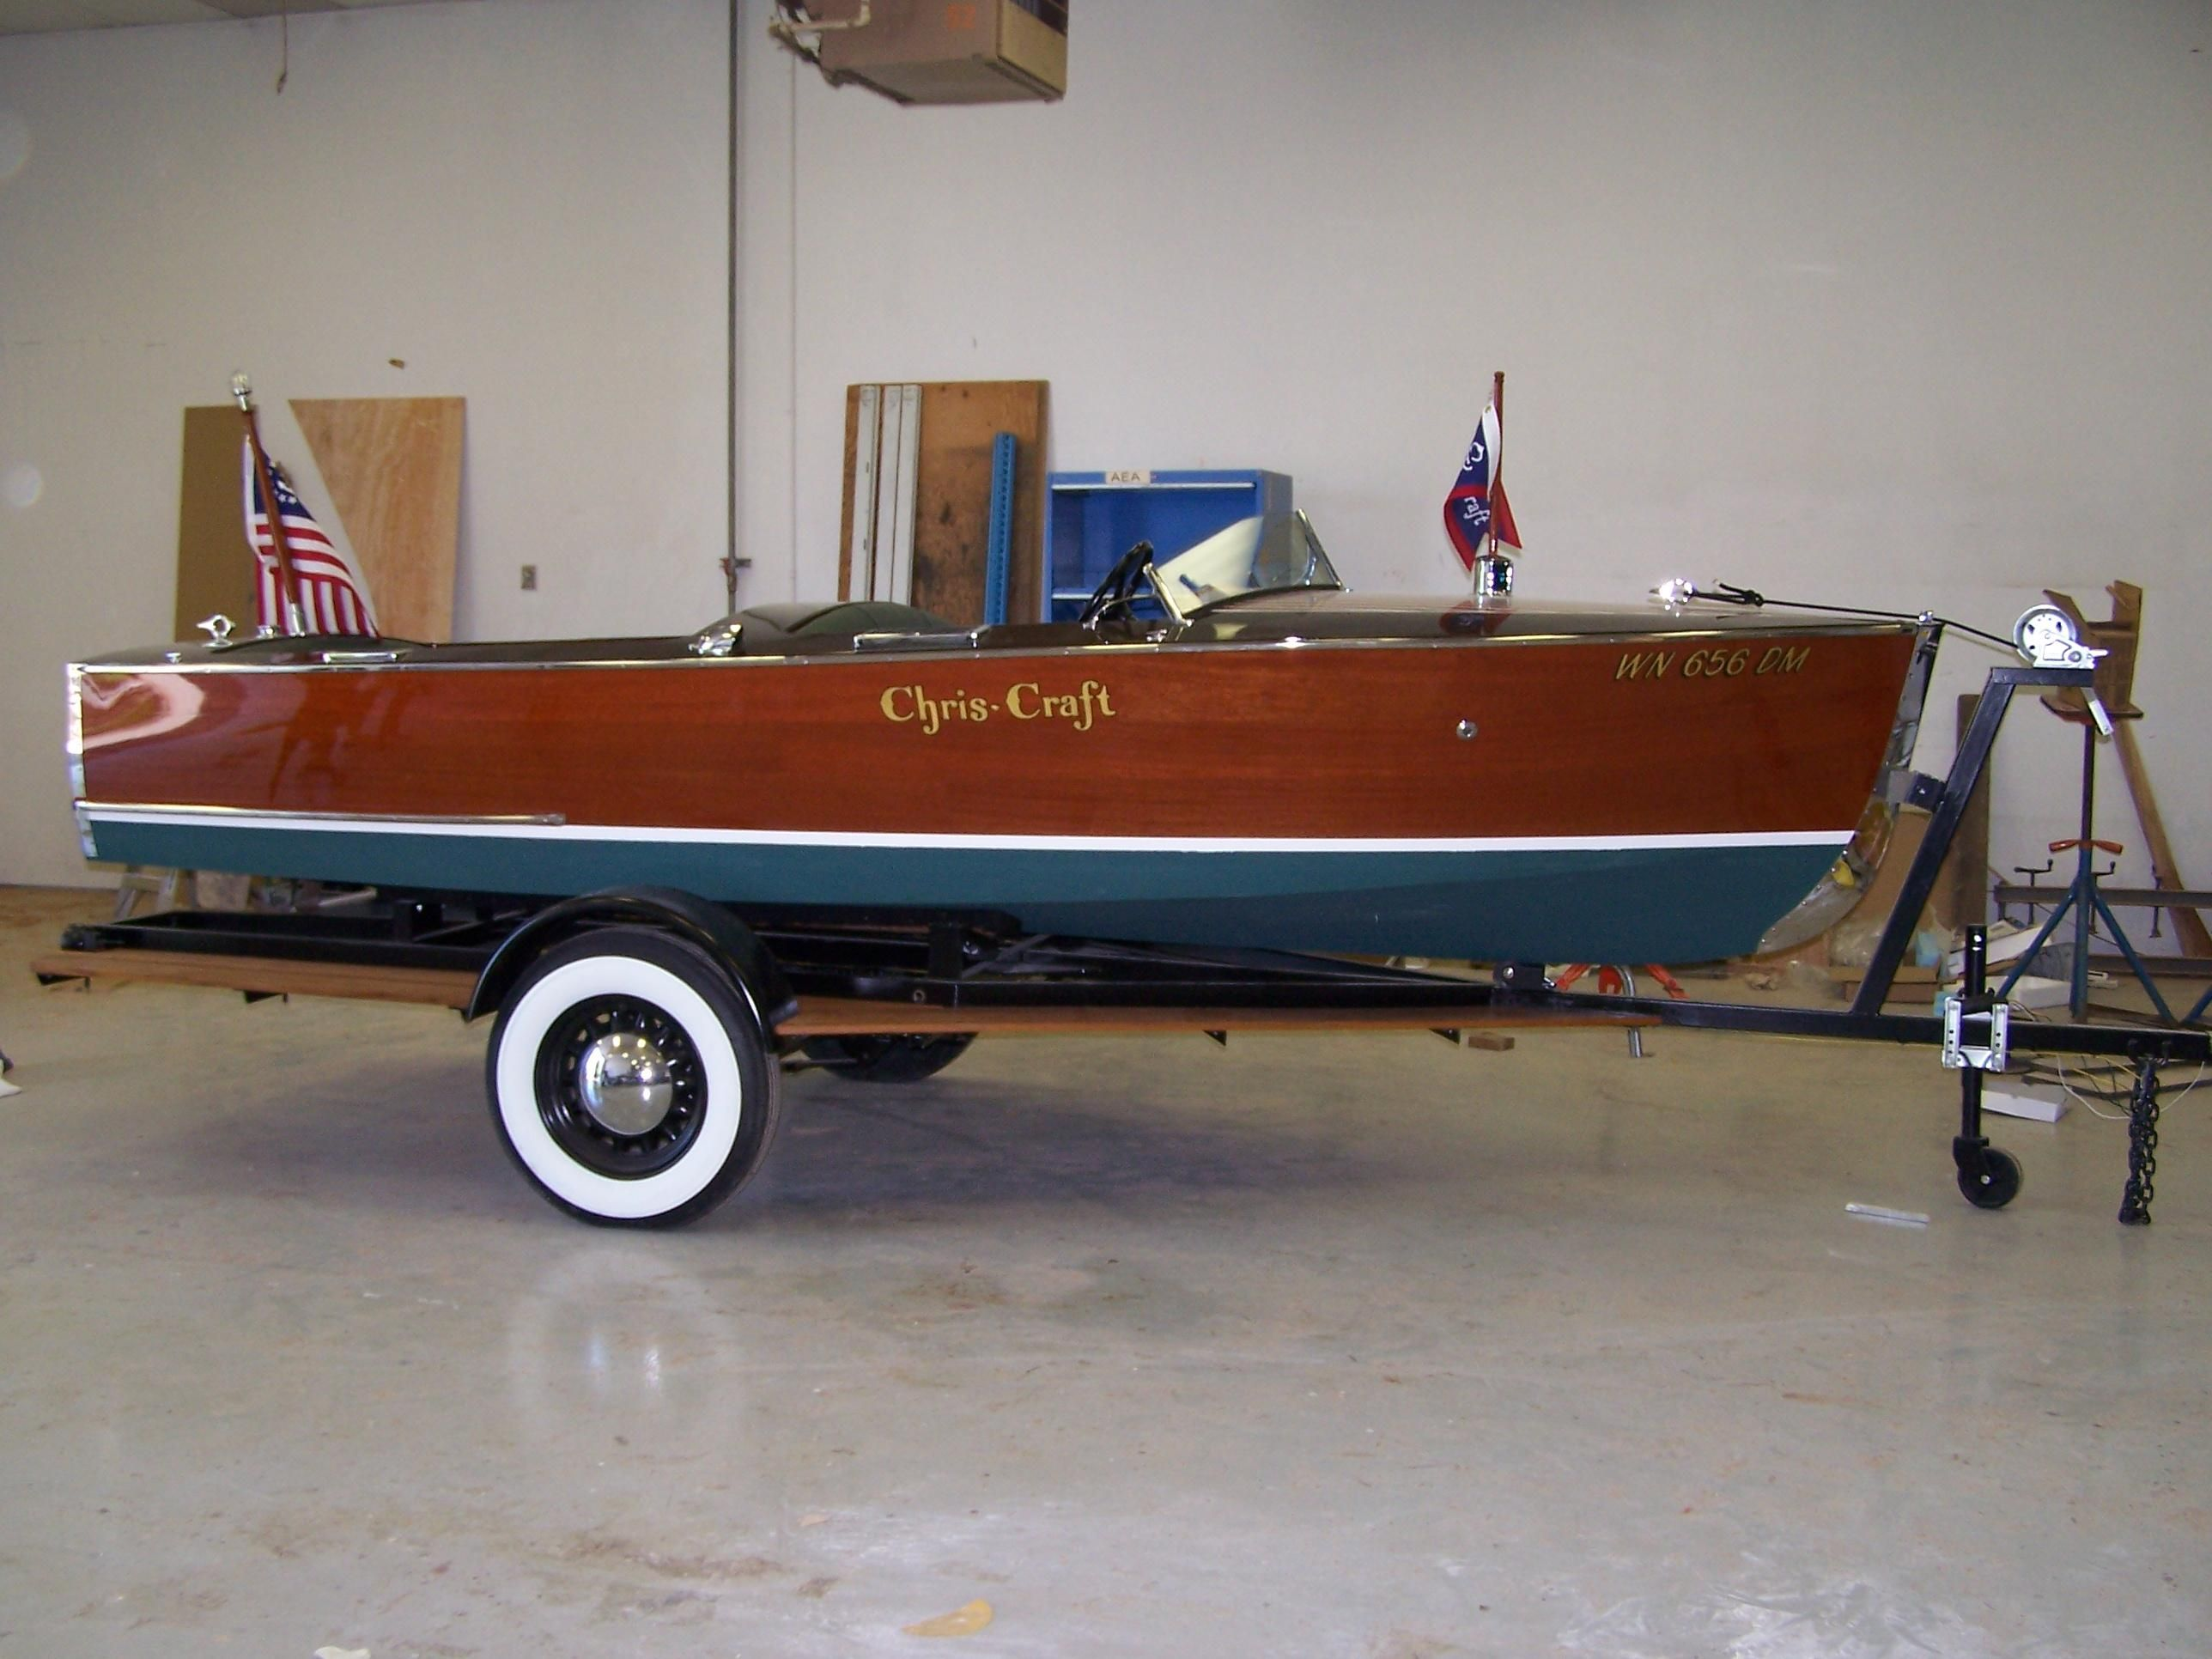 1939 chris craft sportsman runabout restored motor b d til for Chris craft boat club